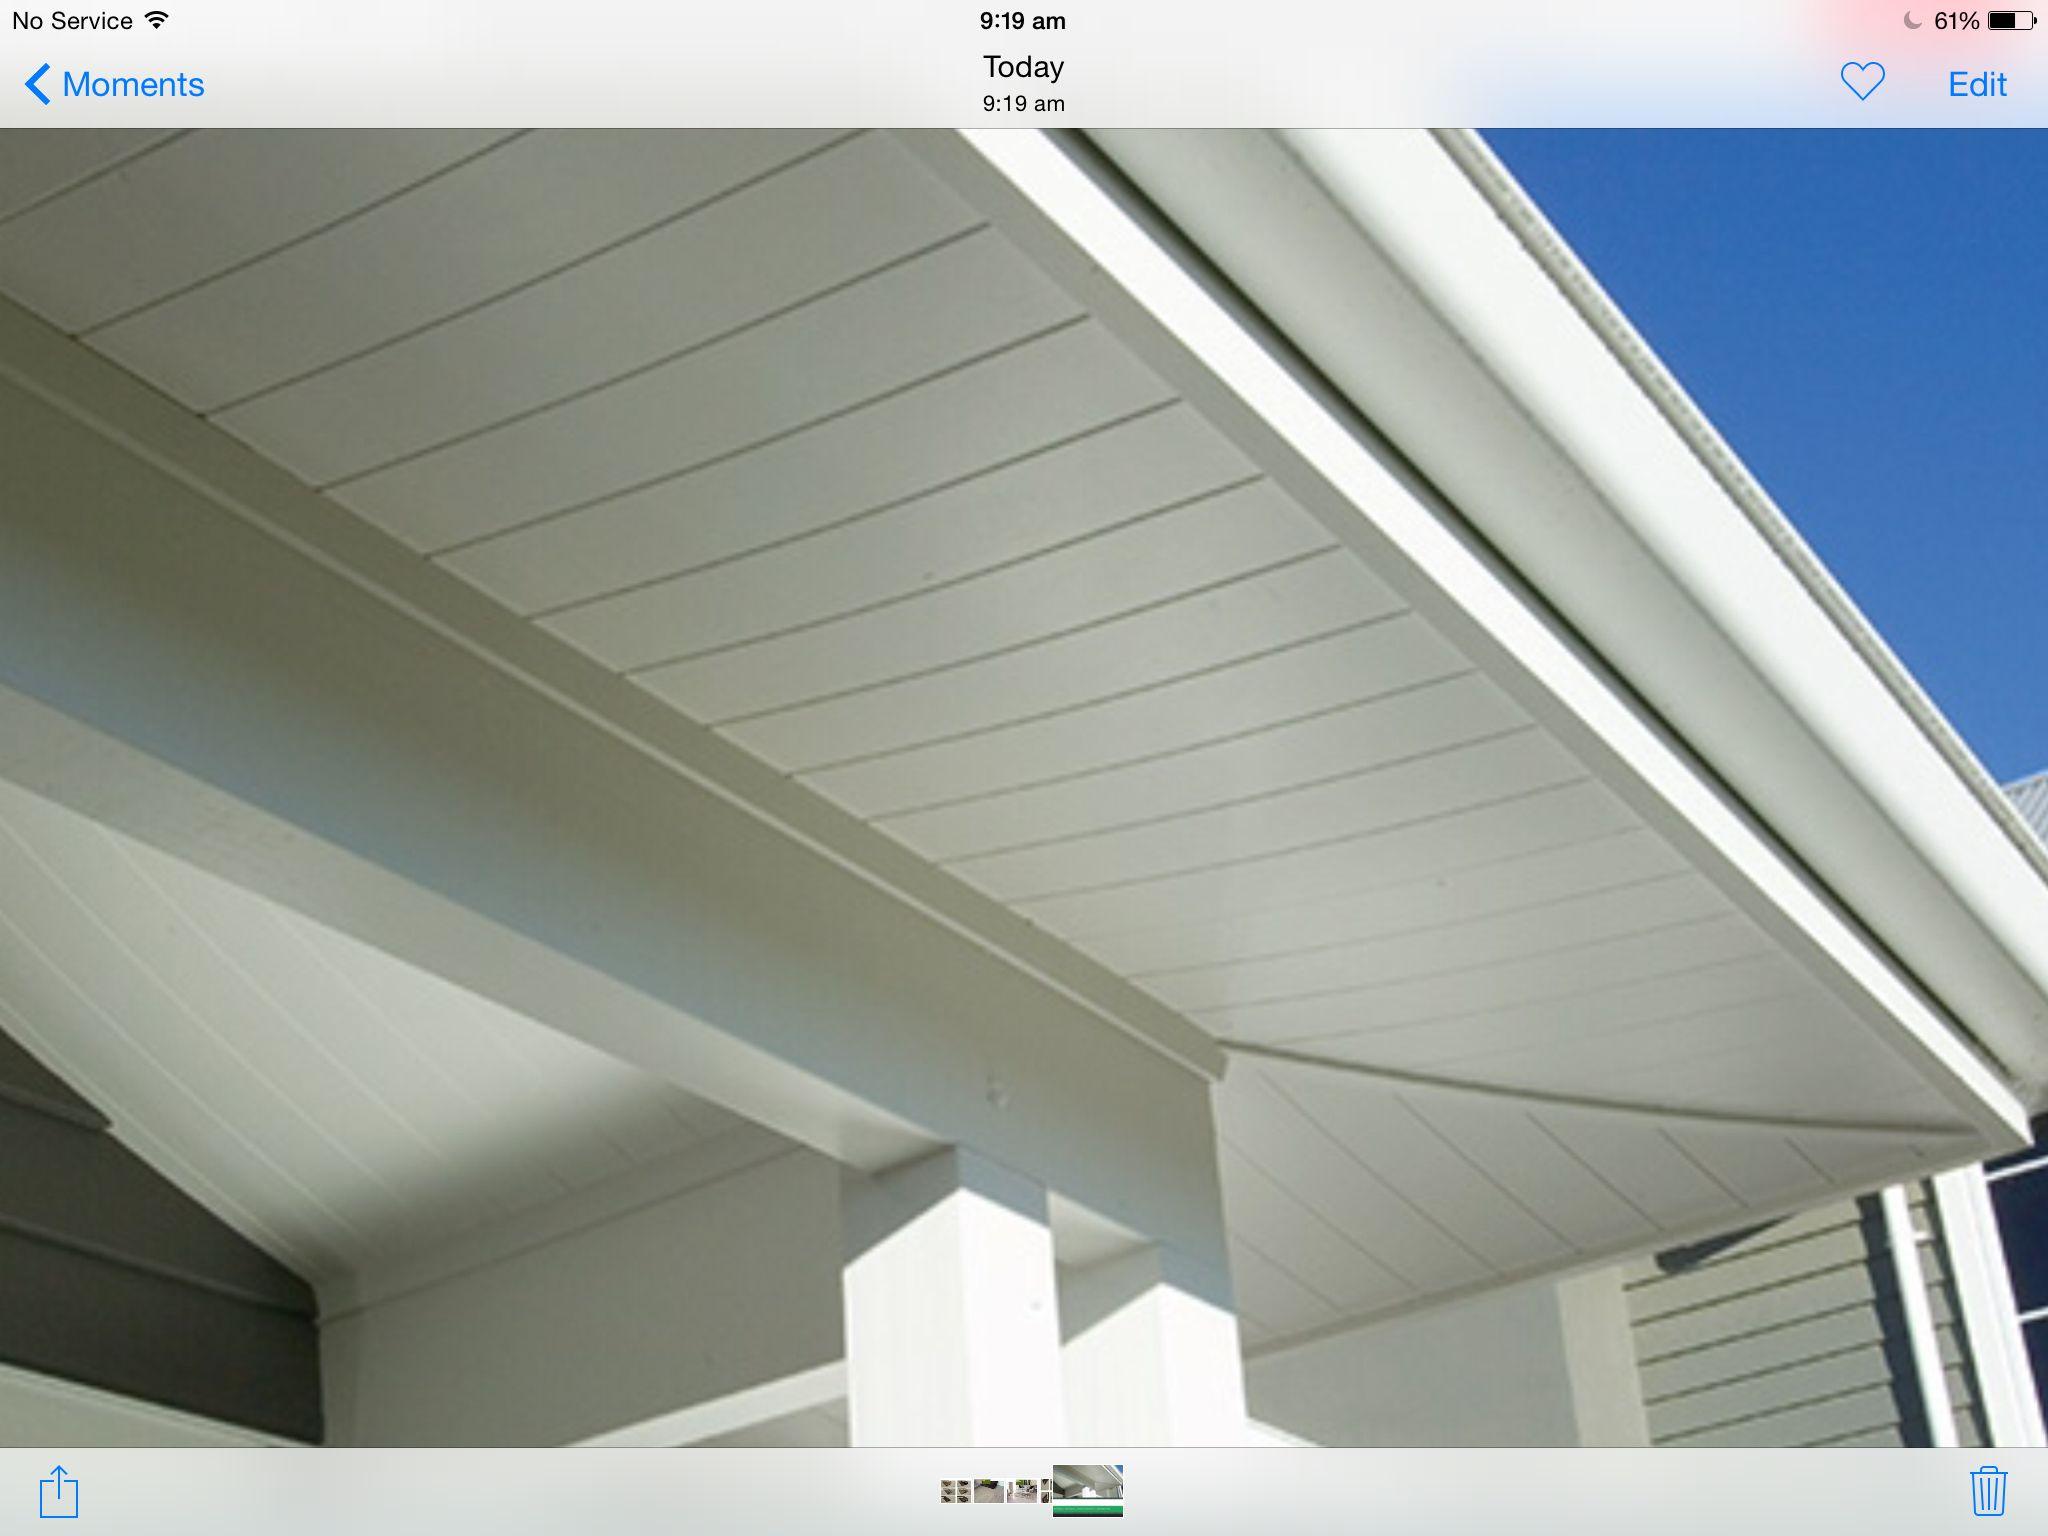 James Hardie Hardiegroove Roofing Interior Concrete